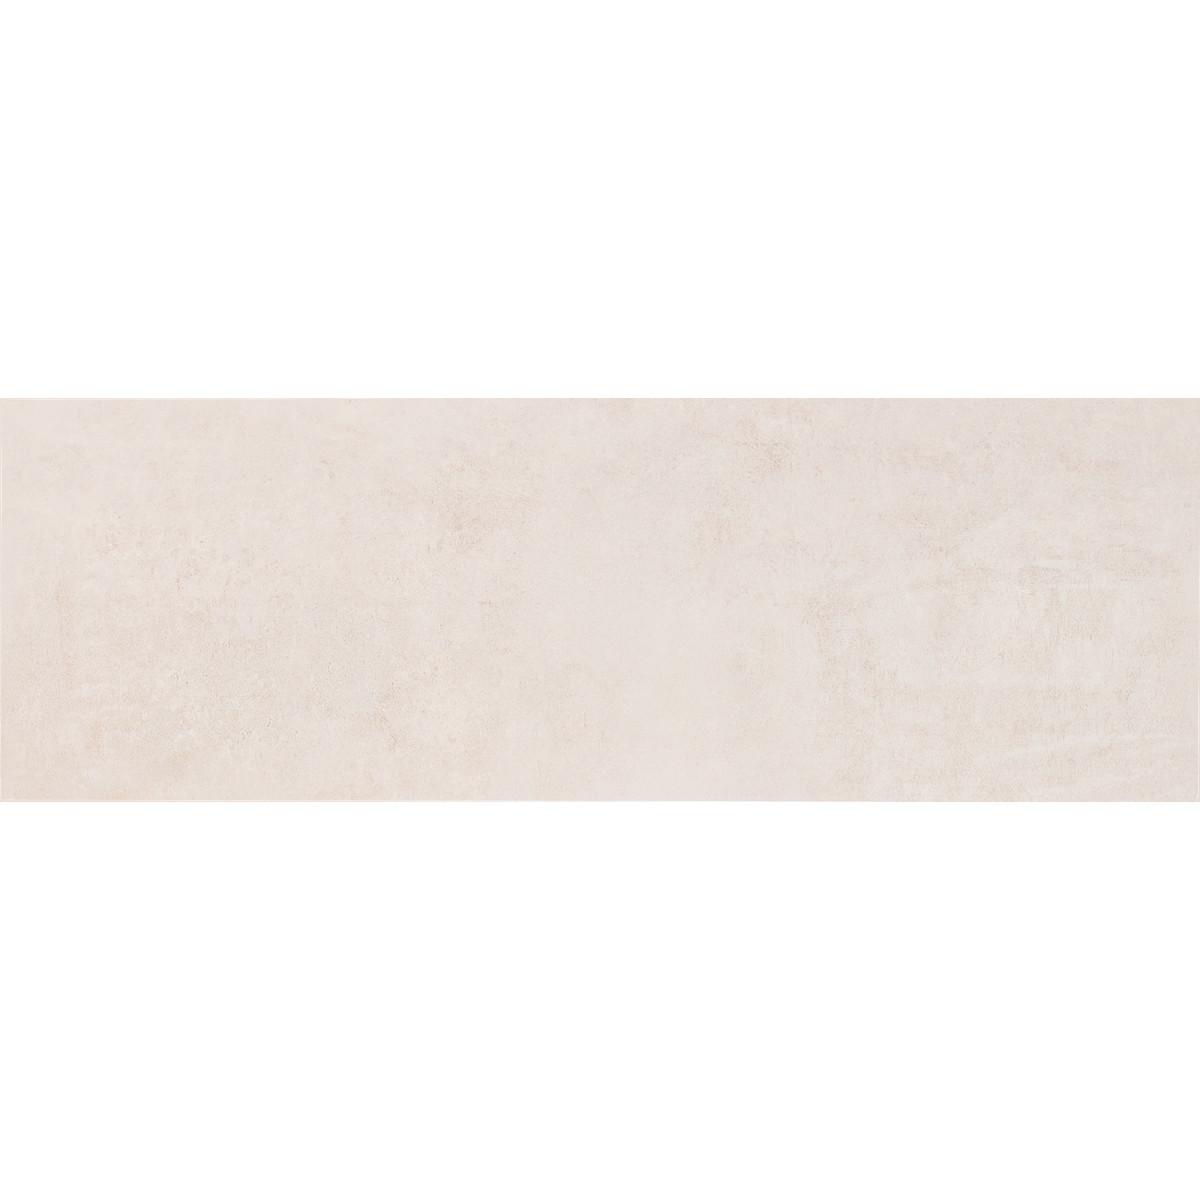 Плитка настенная Spanish Maiolica 20х60 см 0.84 м2 цвет белый